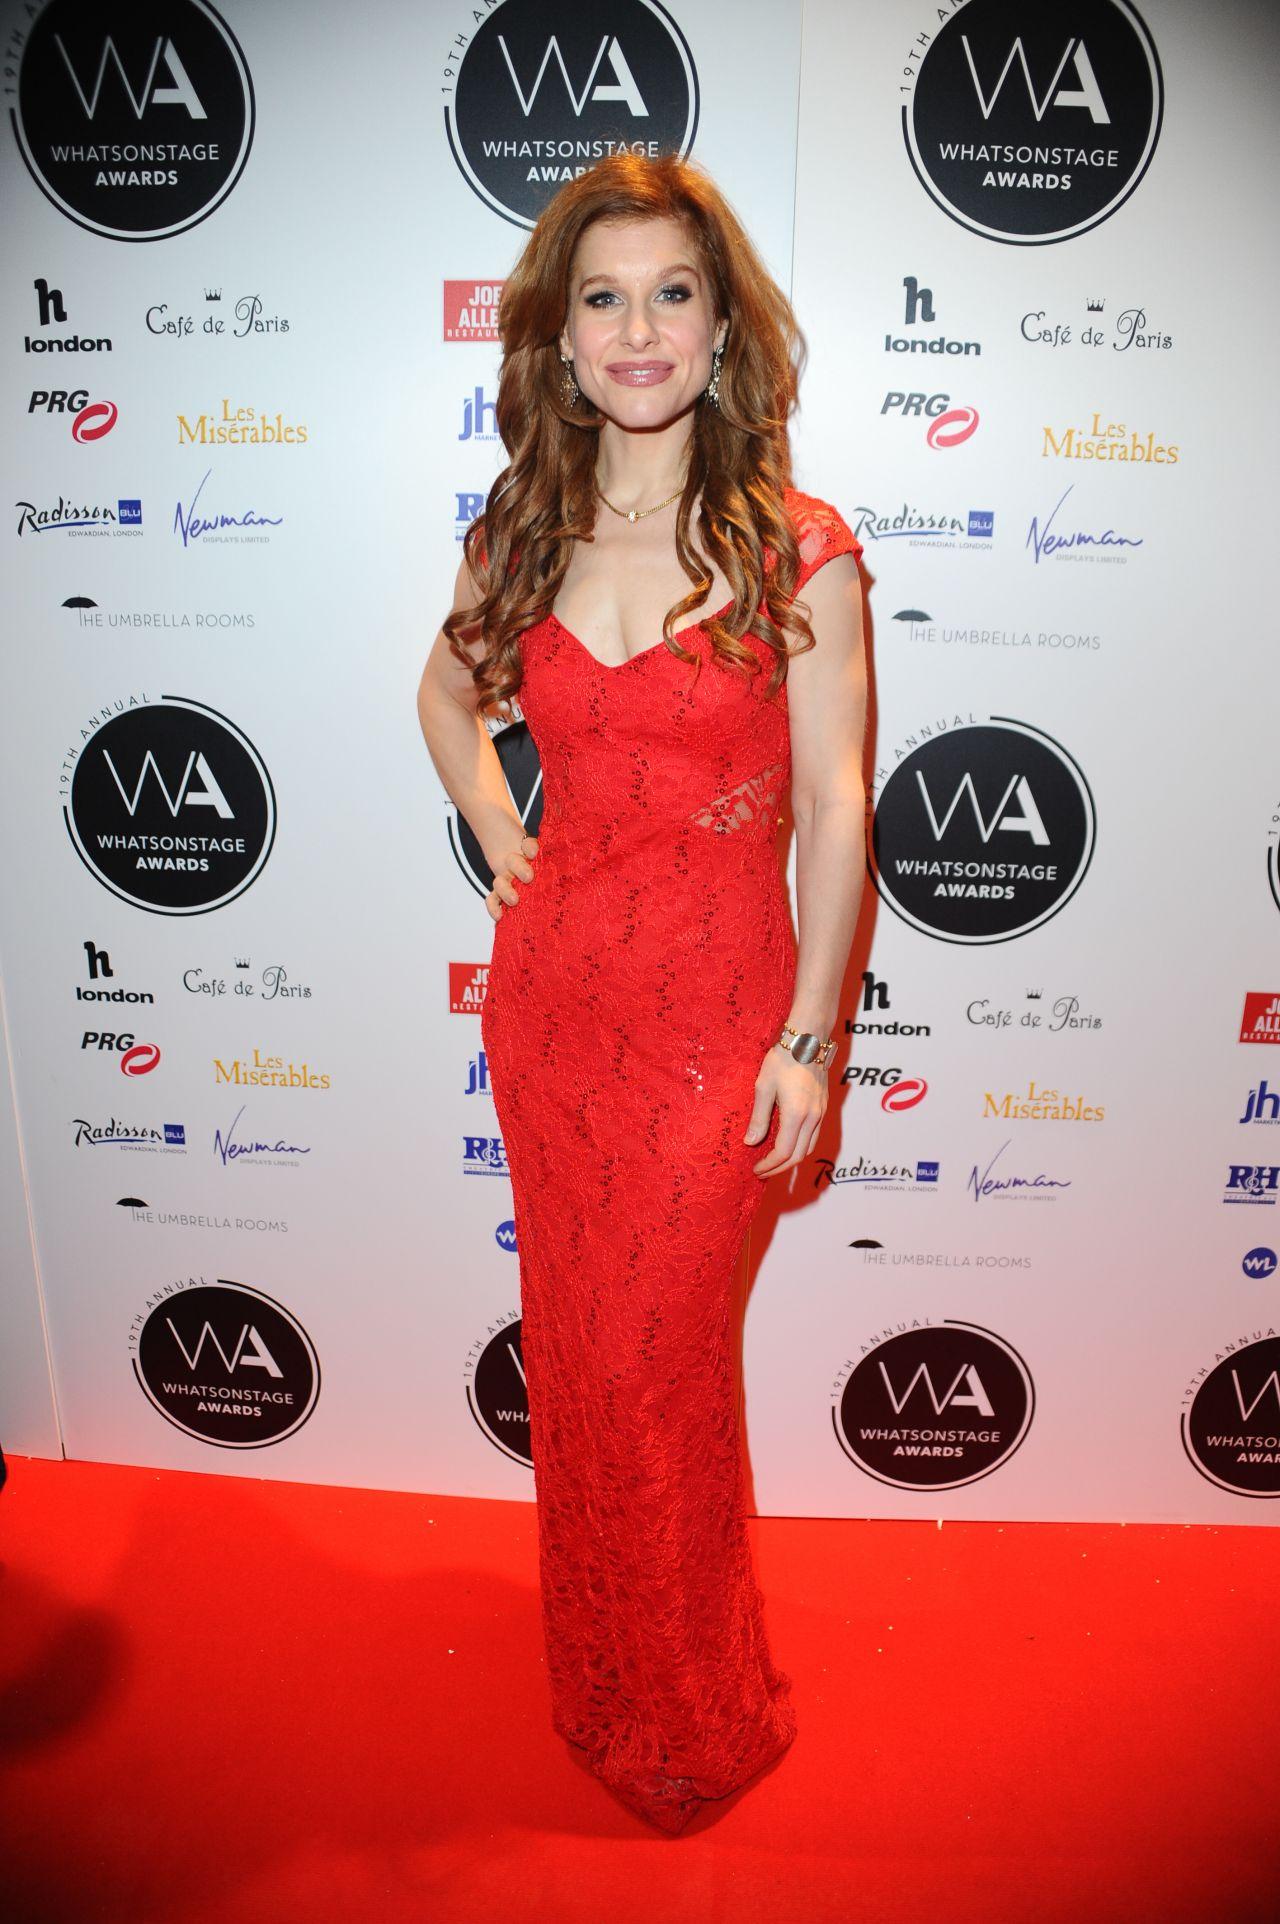 Hannah Waddingham al Whatsonstage Awards 2019 al Prince of